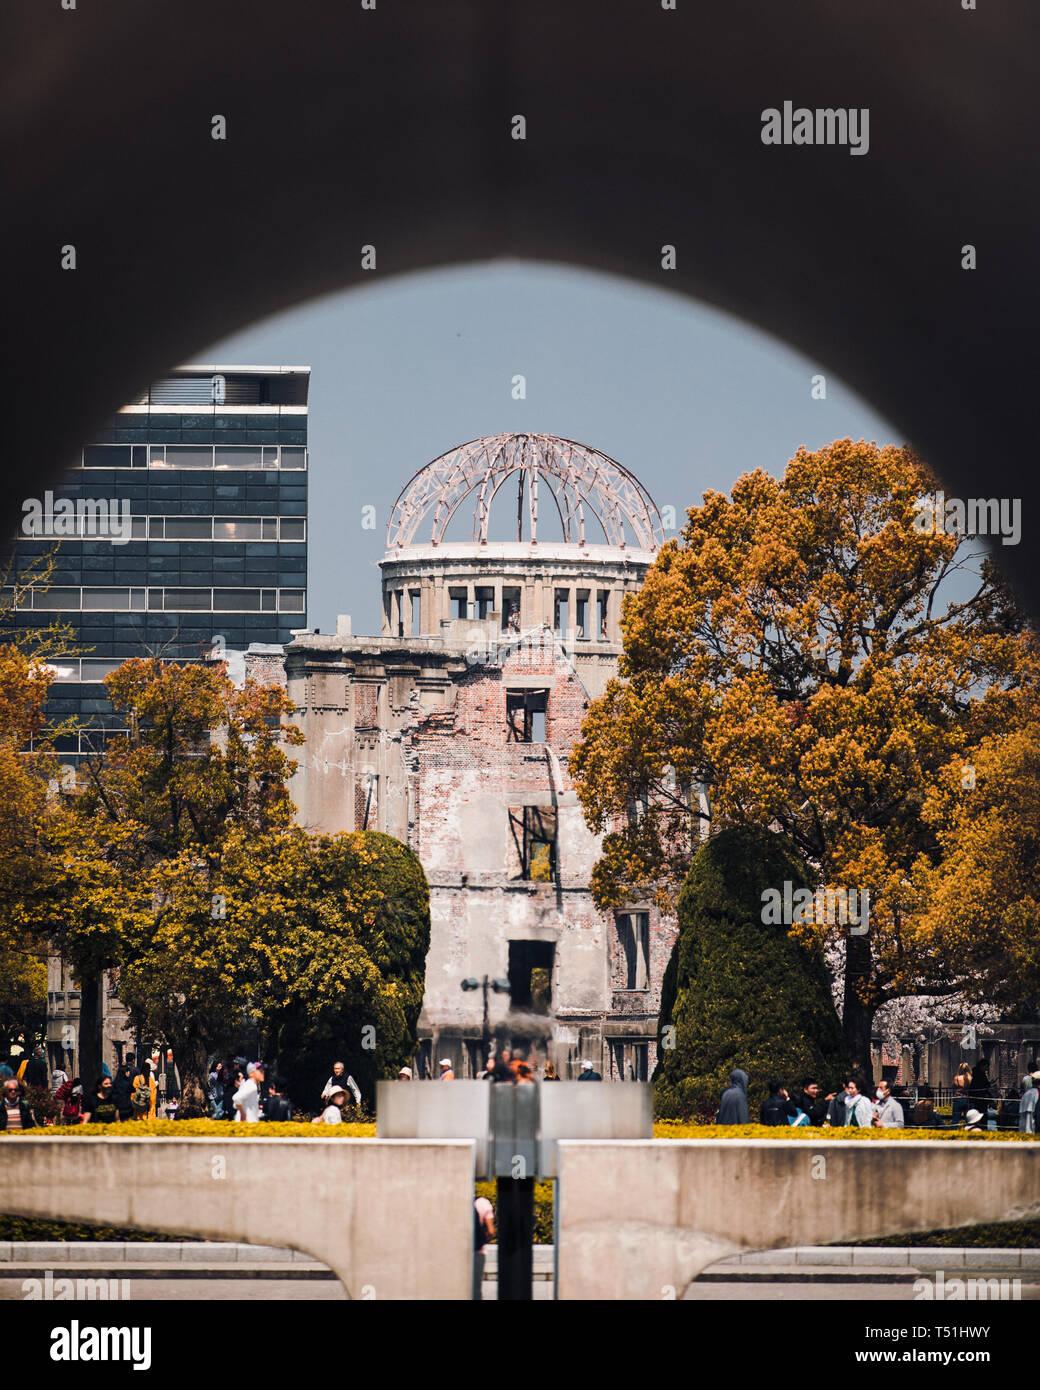 Atomic bomb dome in Hiroshima, Japan while Cherry blossom season - Stock Image